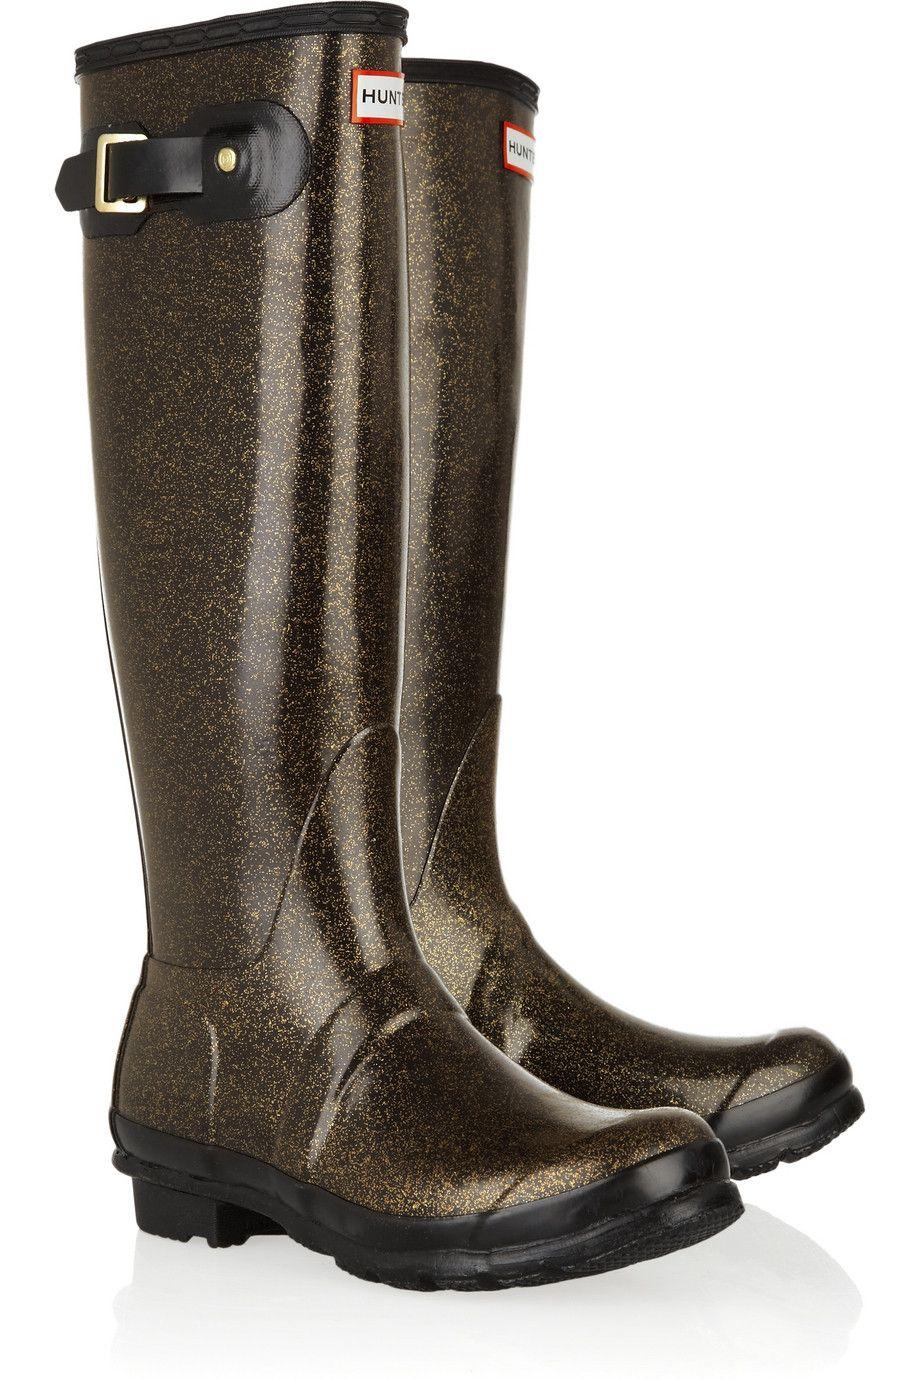 f13b832c34 HUNTER Original Tall Glitter Wellington boots  145. Botas BrilhantesSapatos  LampejantesOuro BrilhanteBota ...